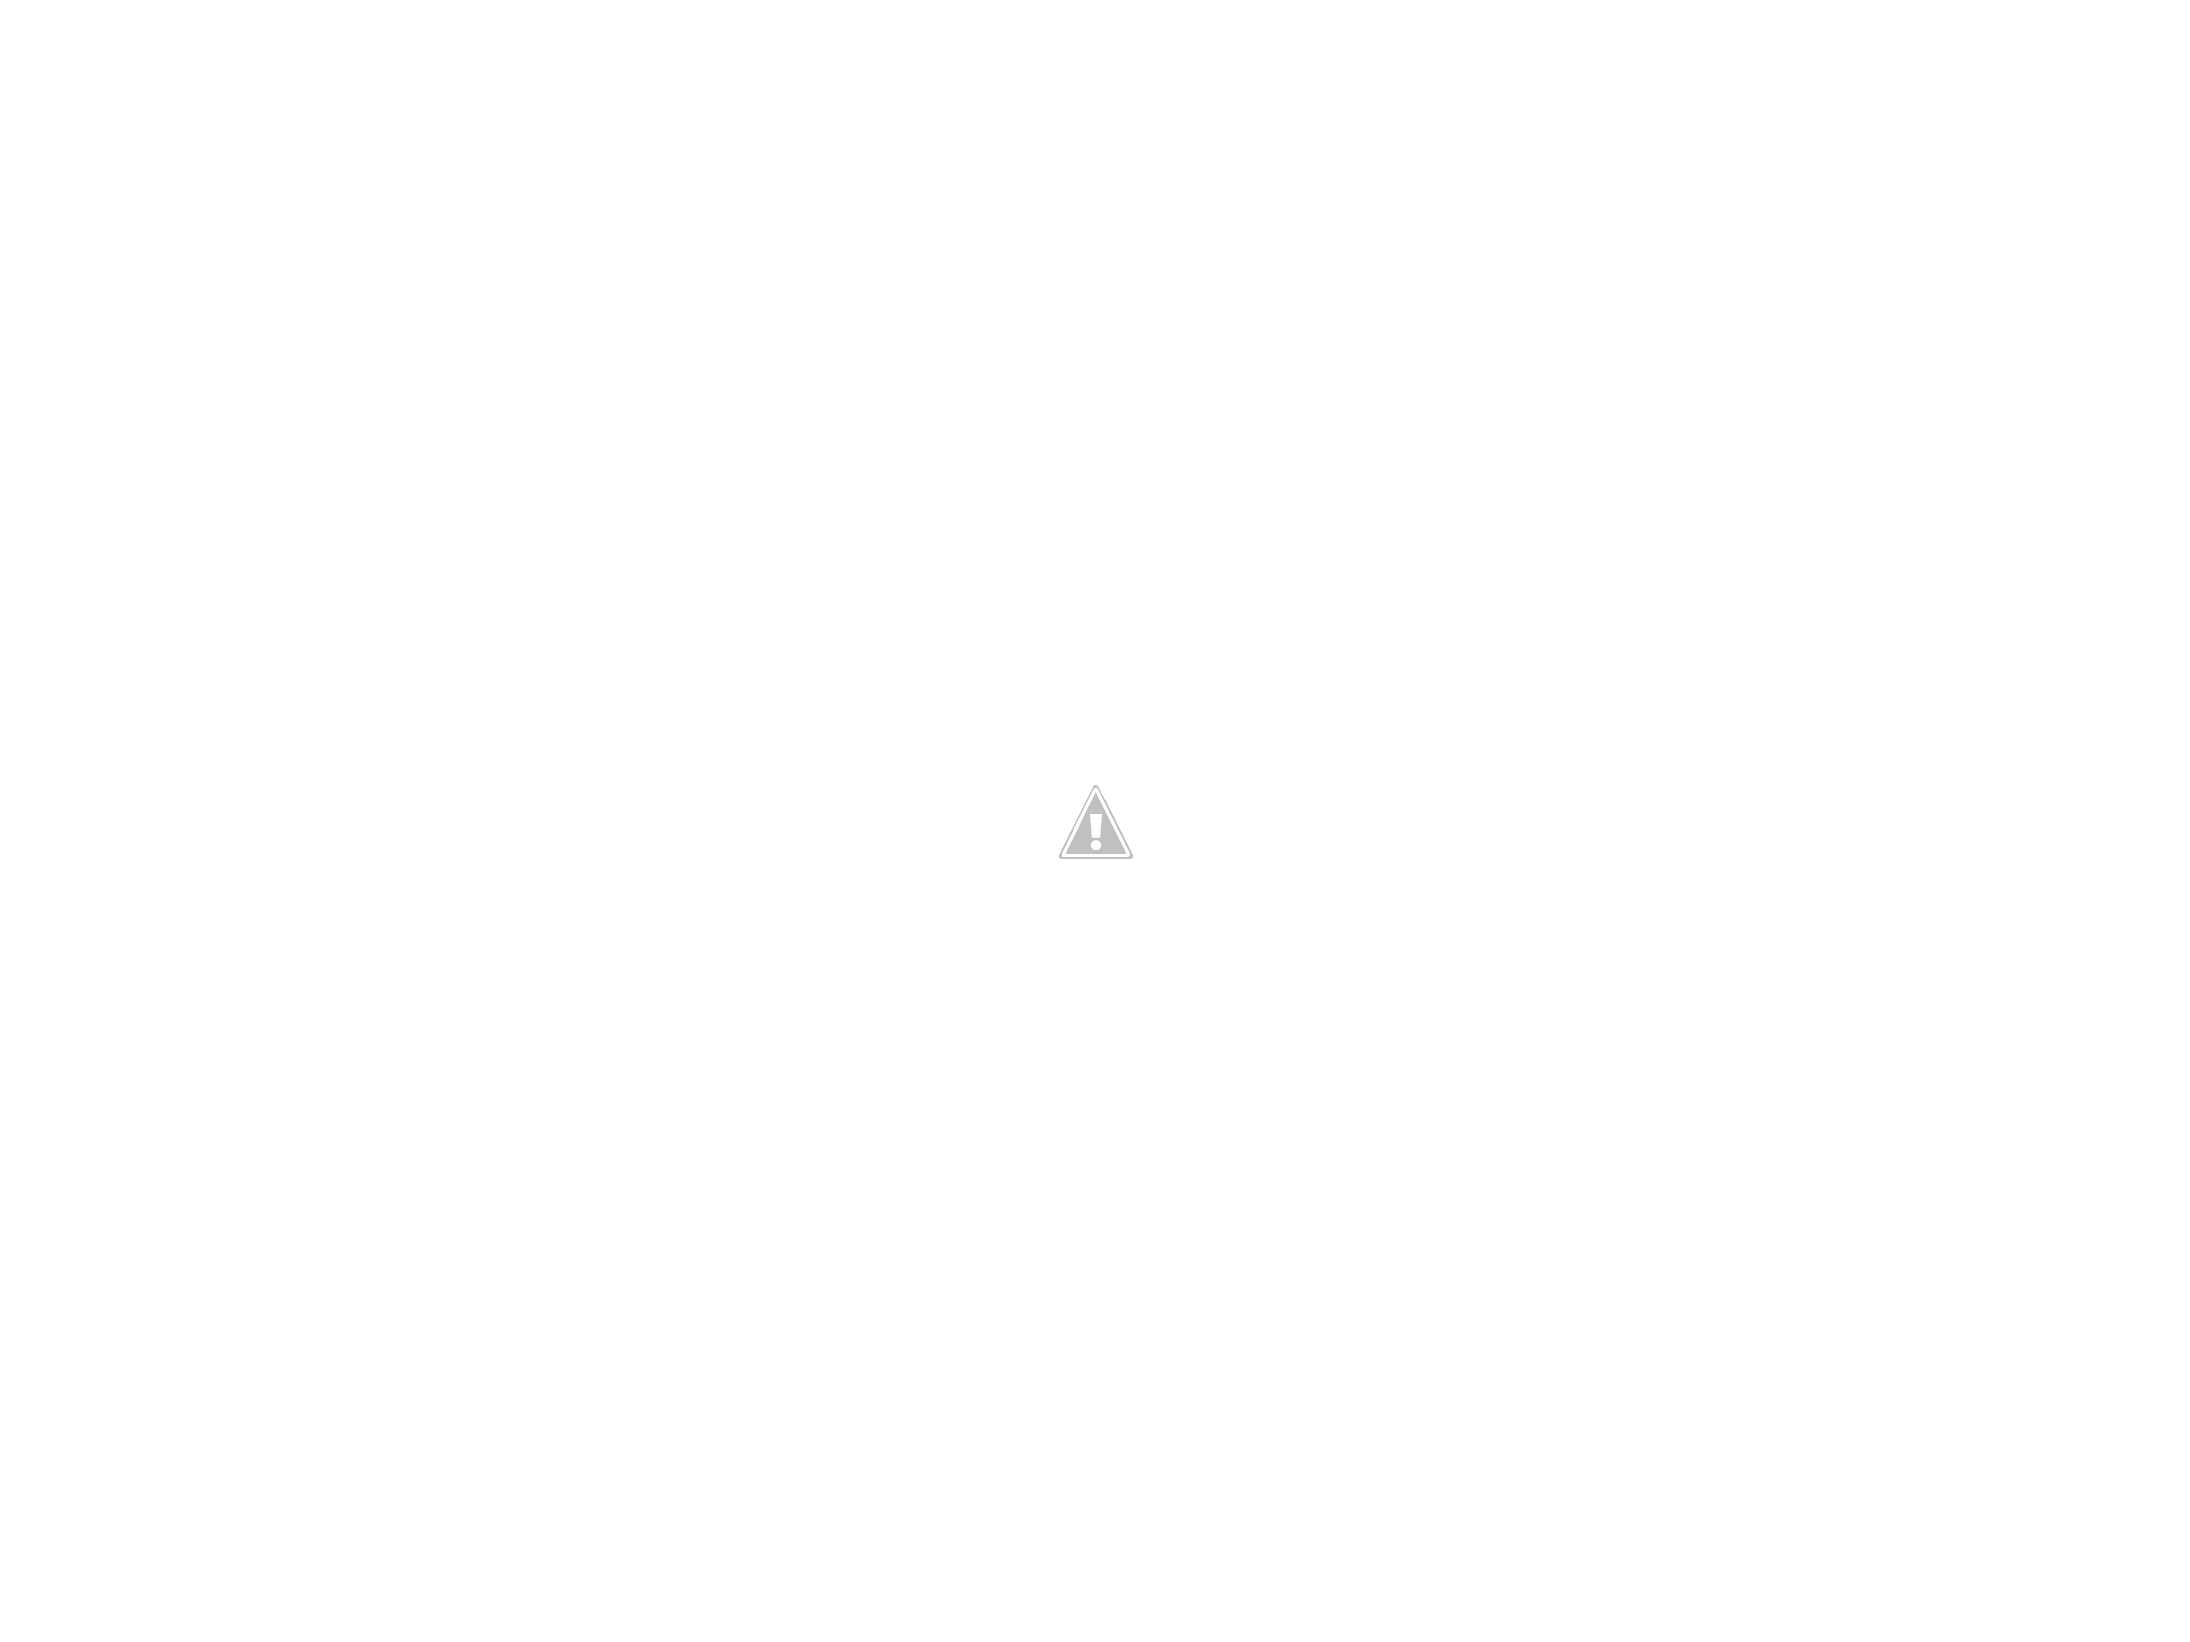 TWKXL專業版閃電褲EX-加壓、磁力、腰部防護、0.3秒導汗技術,運動用壓力褲選它就對了 @秤瓶樂遊遊